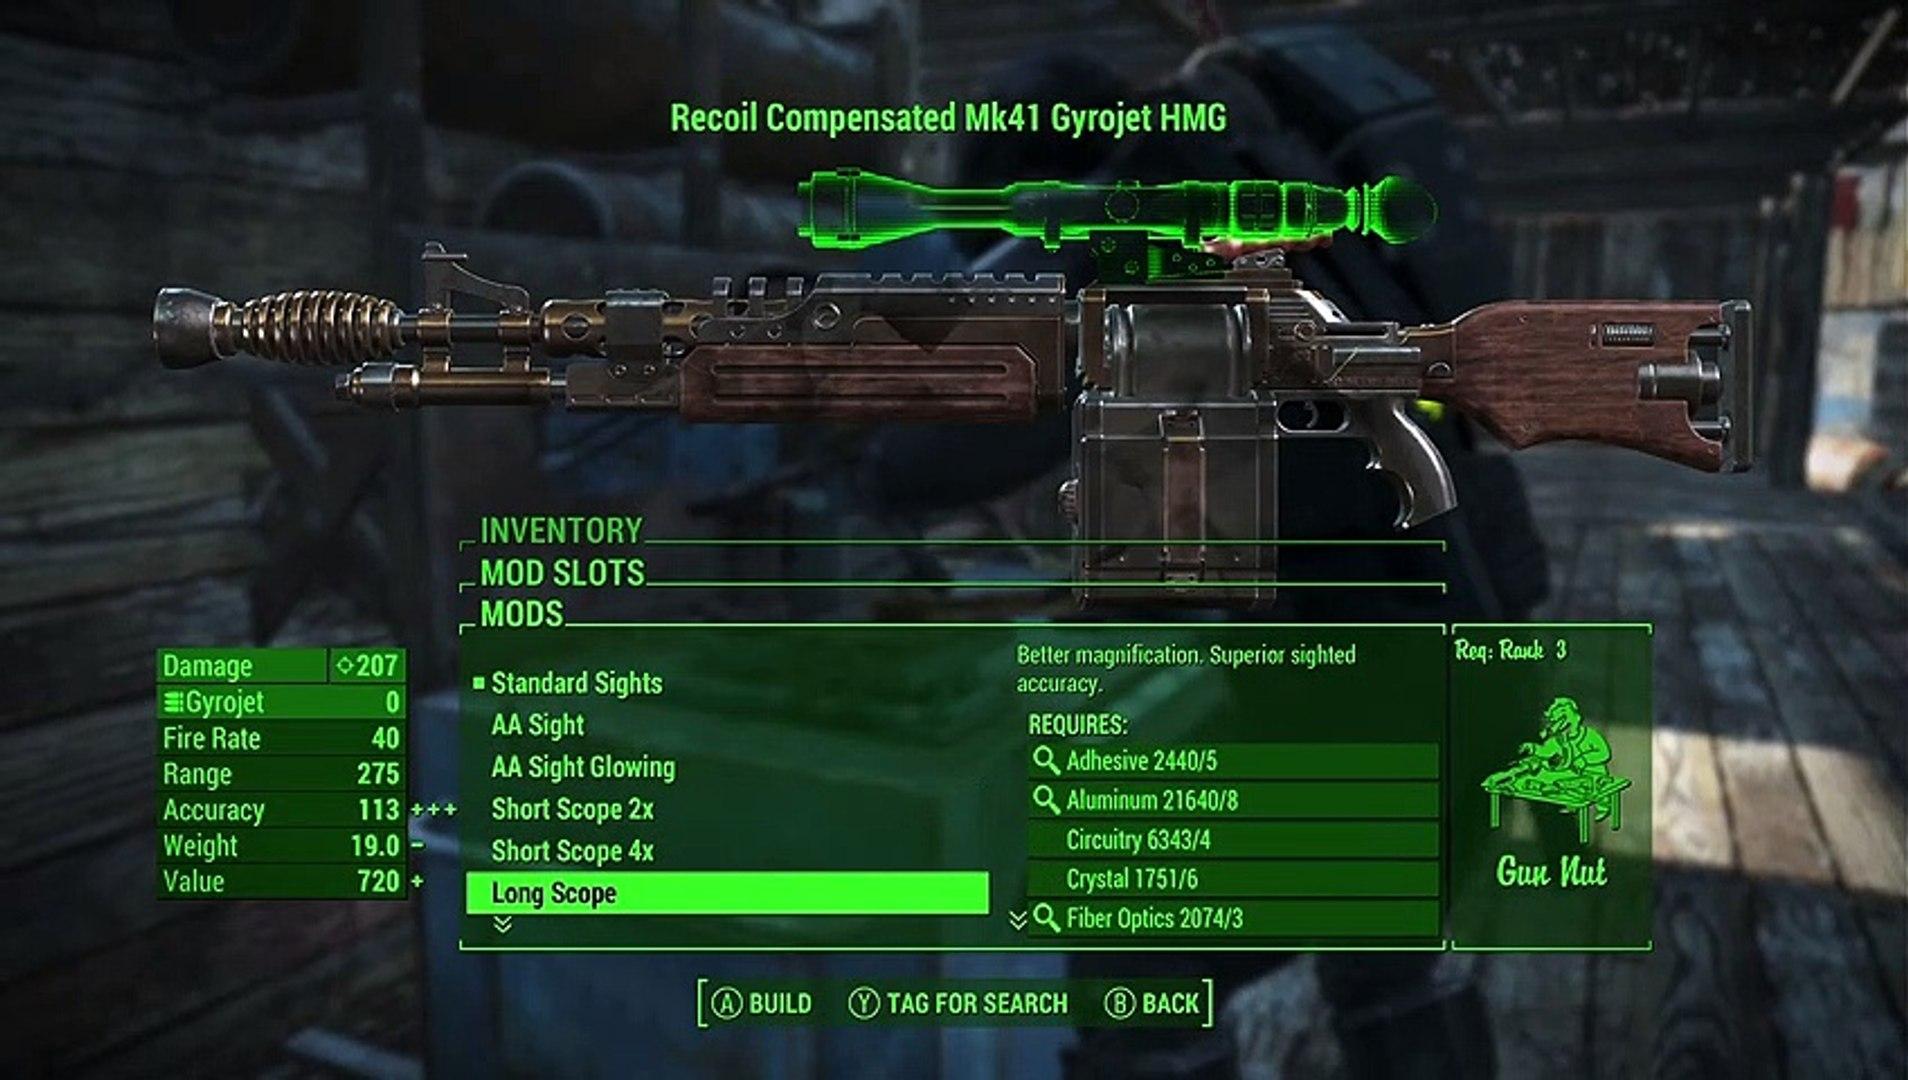 Fallout 4 Mk41 Gyrojet Heavy Machine Gun (Xbox One Mod)